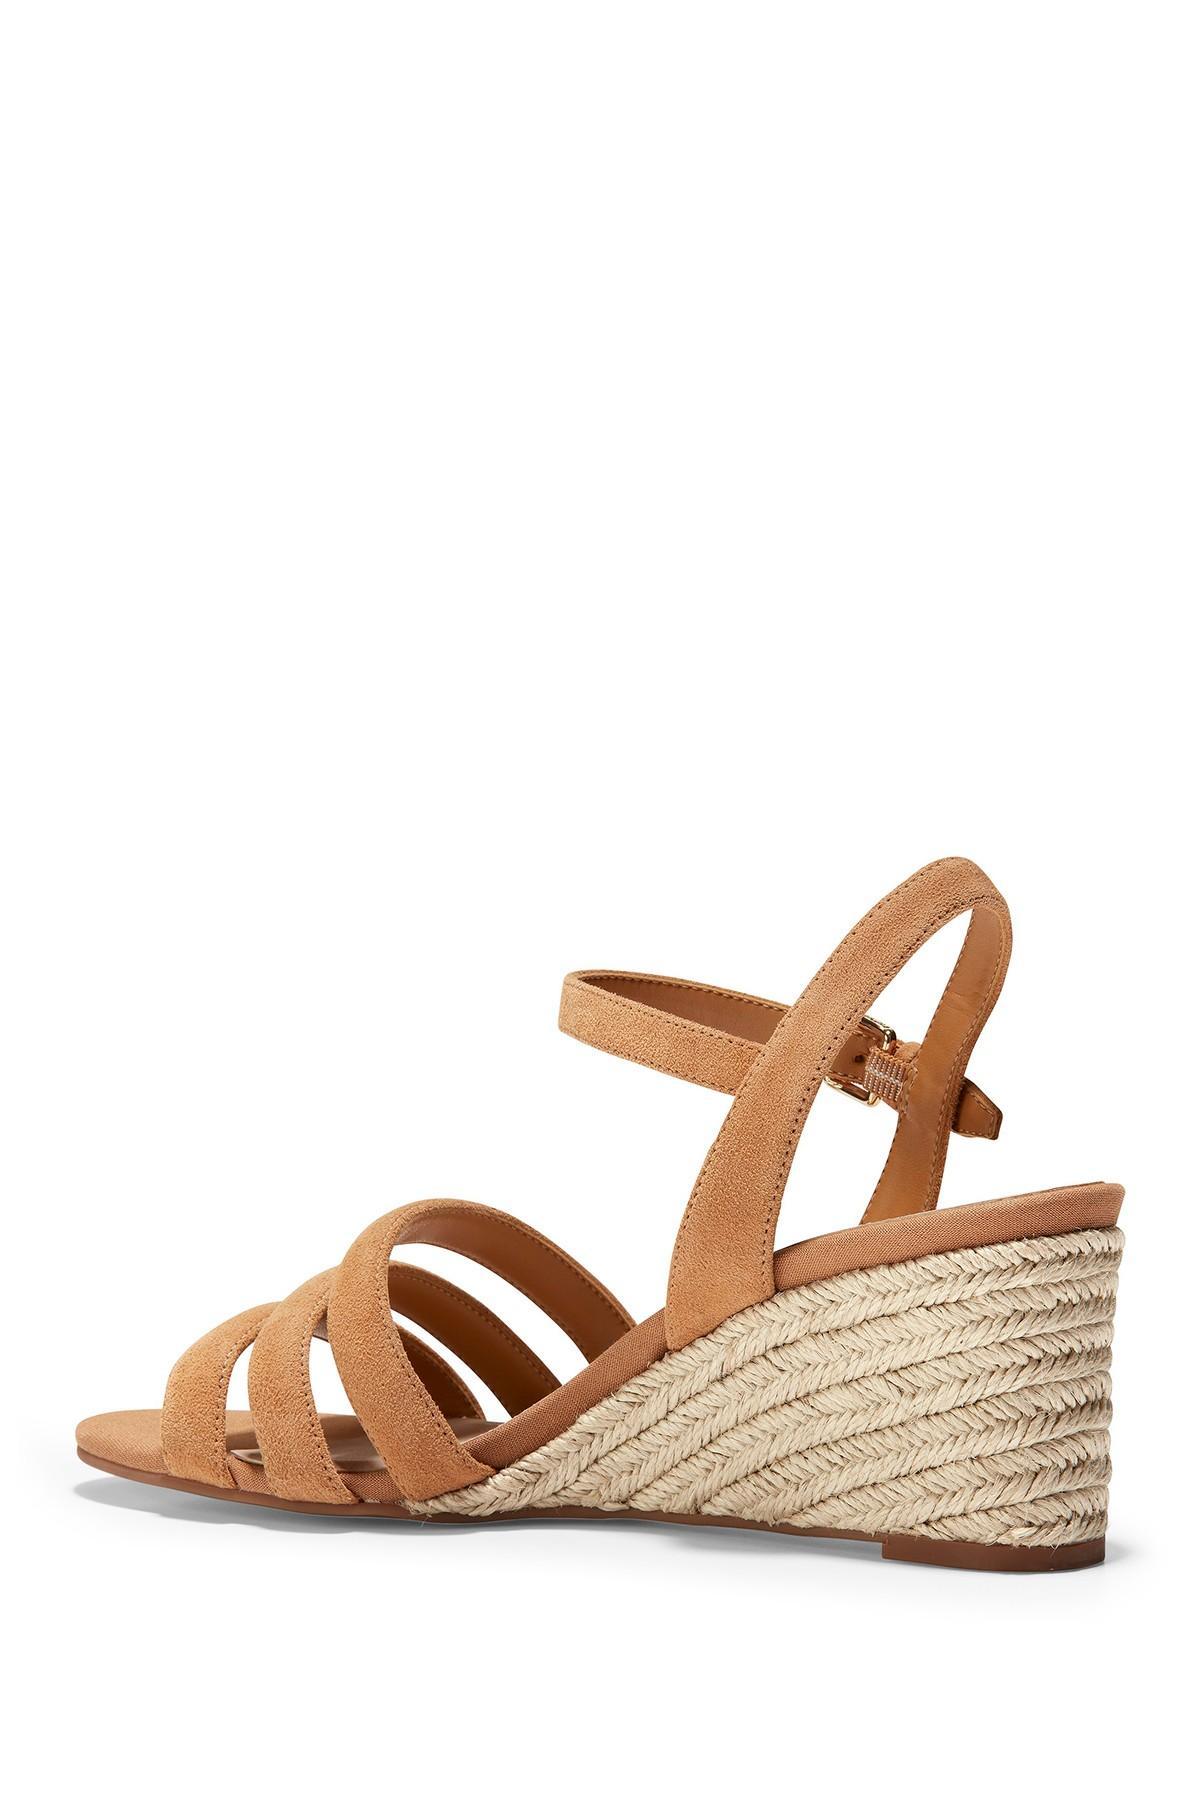 92608c8b0014d Cole Haan - Multicolor Jasmine Espadrille Wedge Sandal - Lyst. View  fullscreen